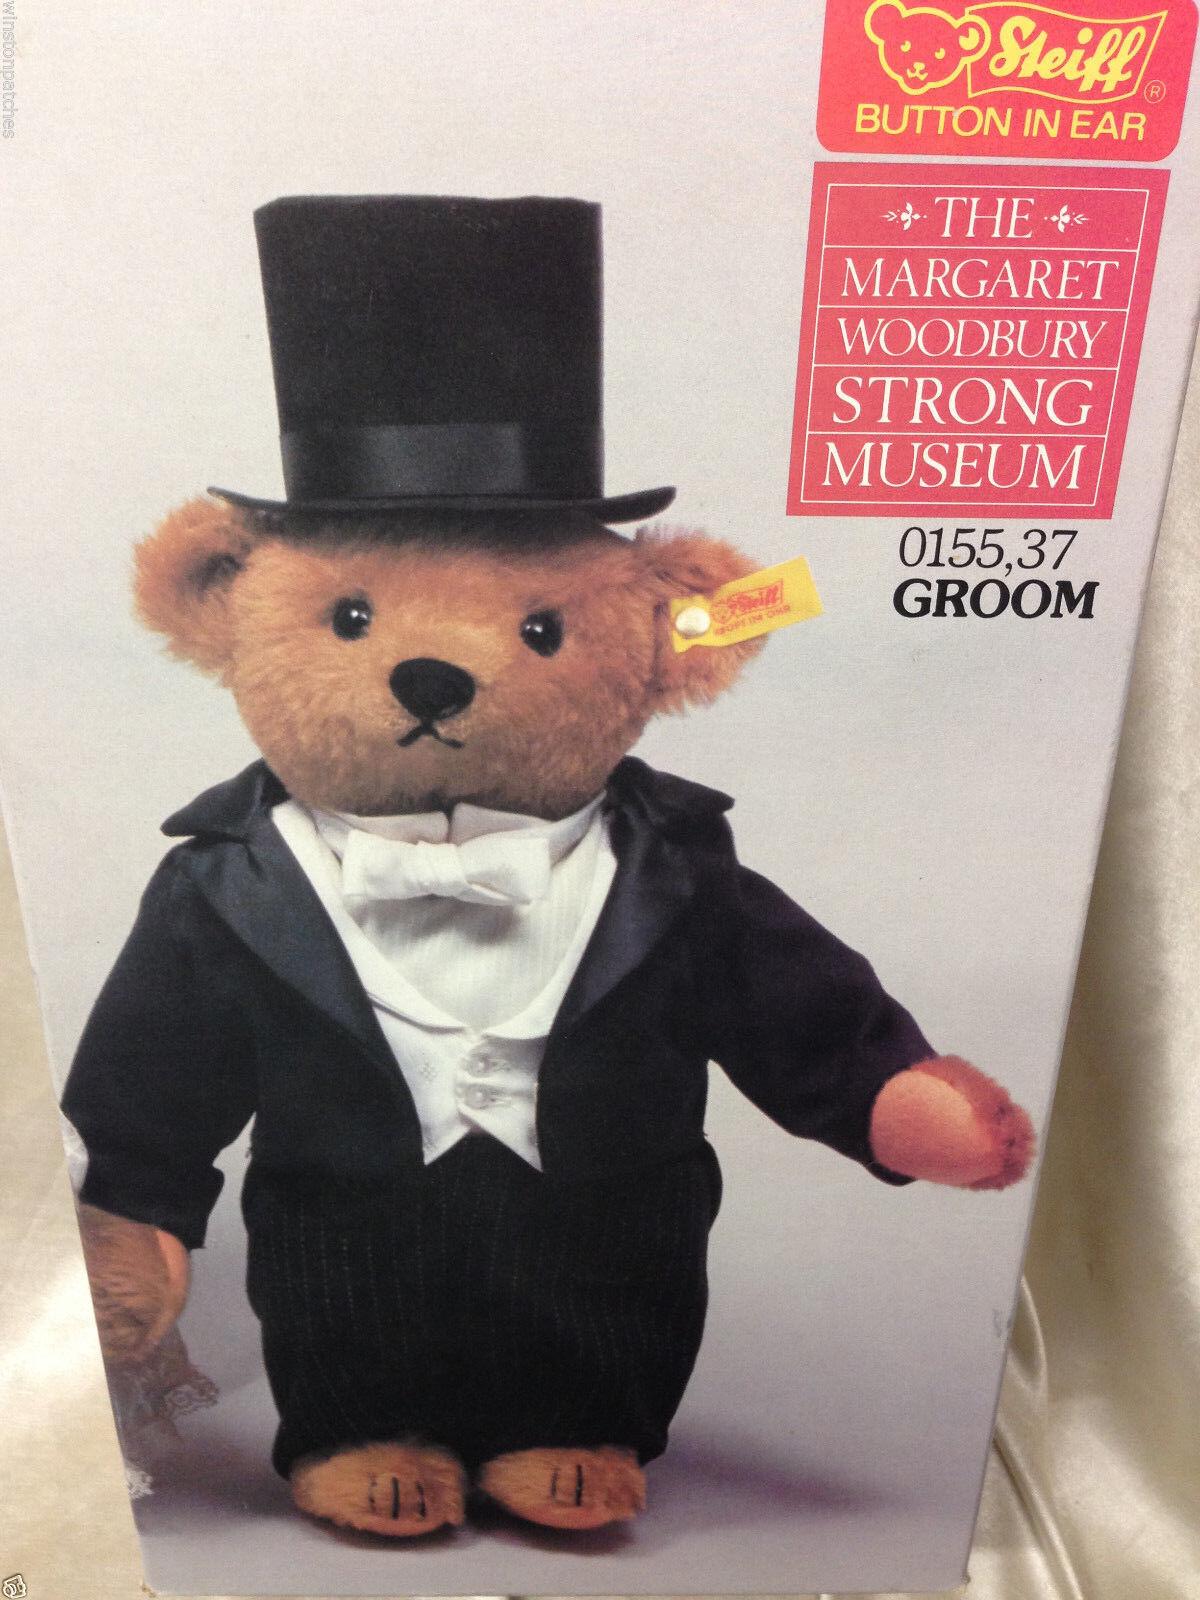 MARGARET WOODBURY STRONG MUSEUM STEIFF TEDDY BEAR GROOM IN ORIGINAL BOX